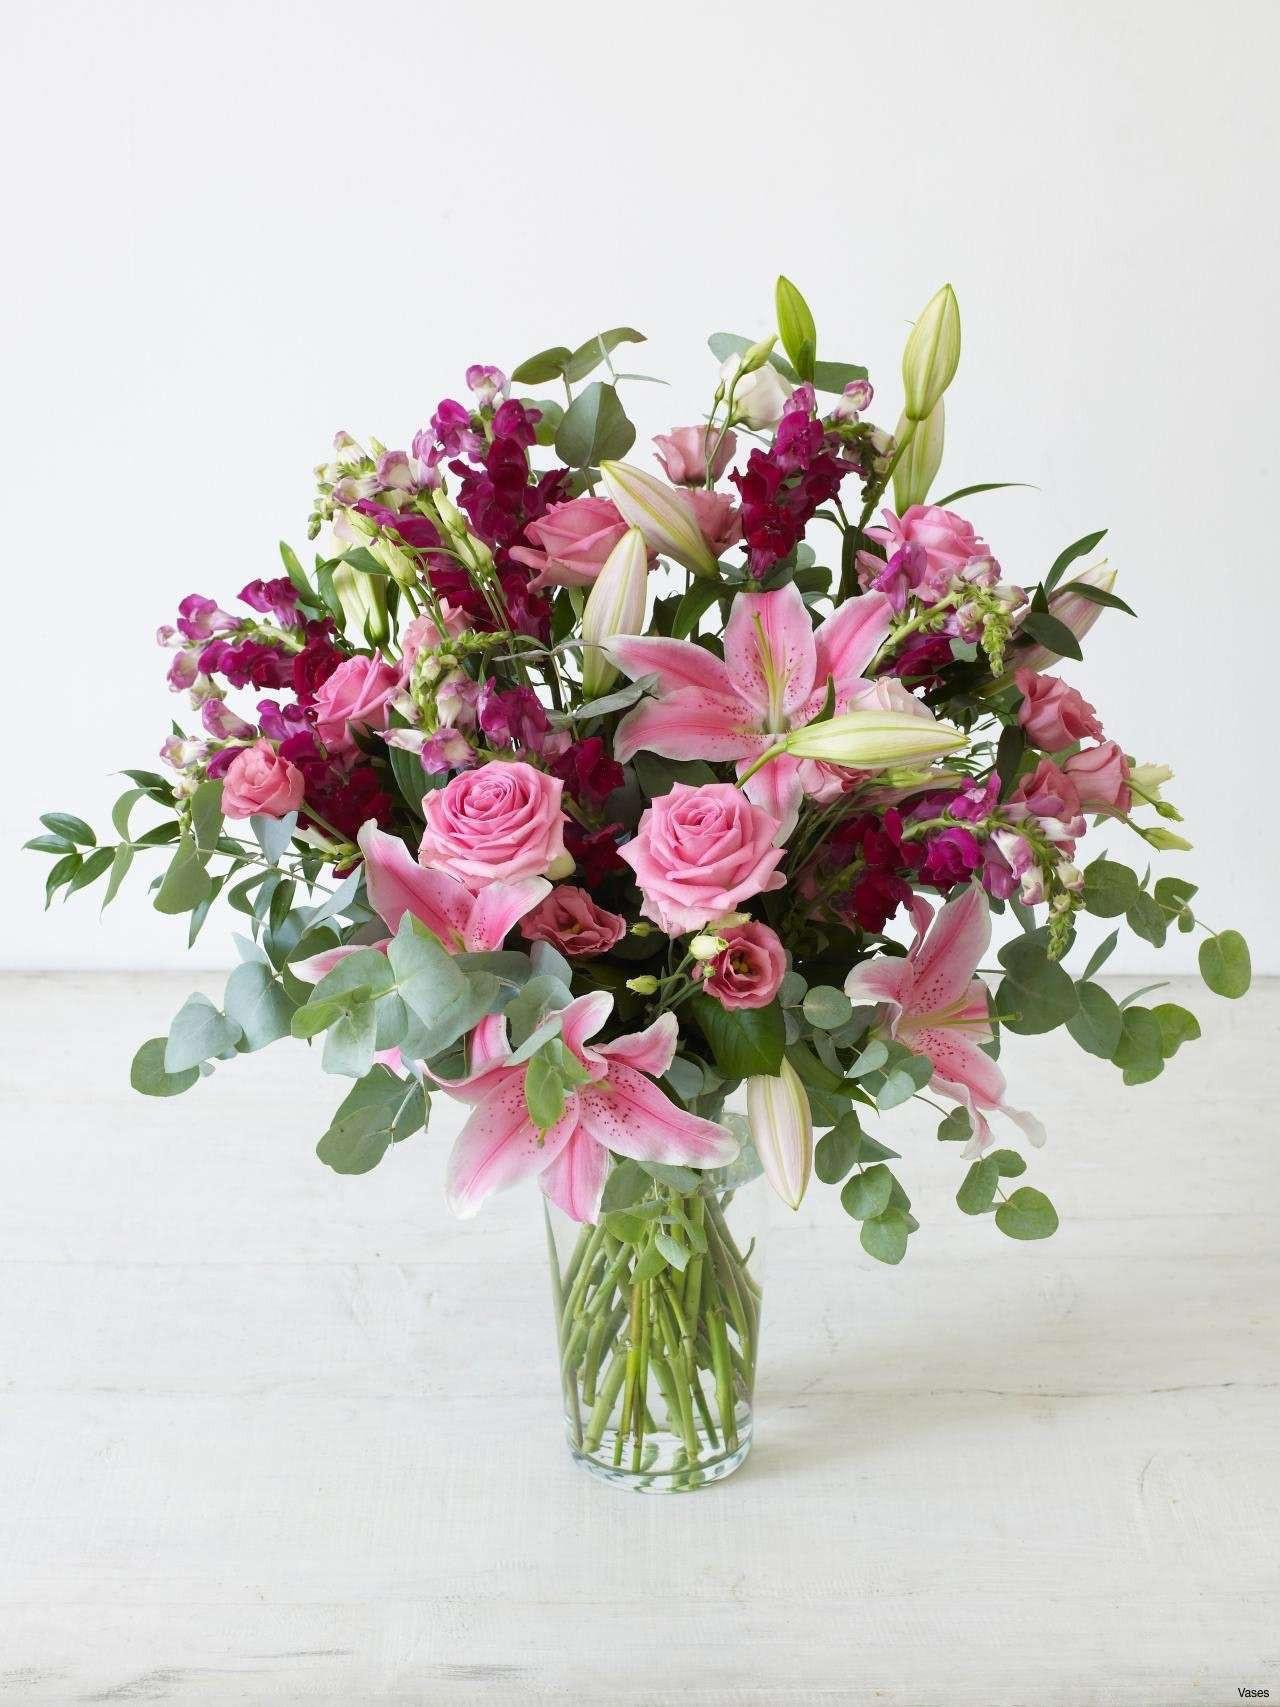 glass vase baby shower centerpieces of table design noyer ganial flower arrangements elegant floral within flower arrangements elegant floral arrangements 0d design ideas